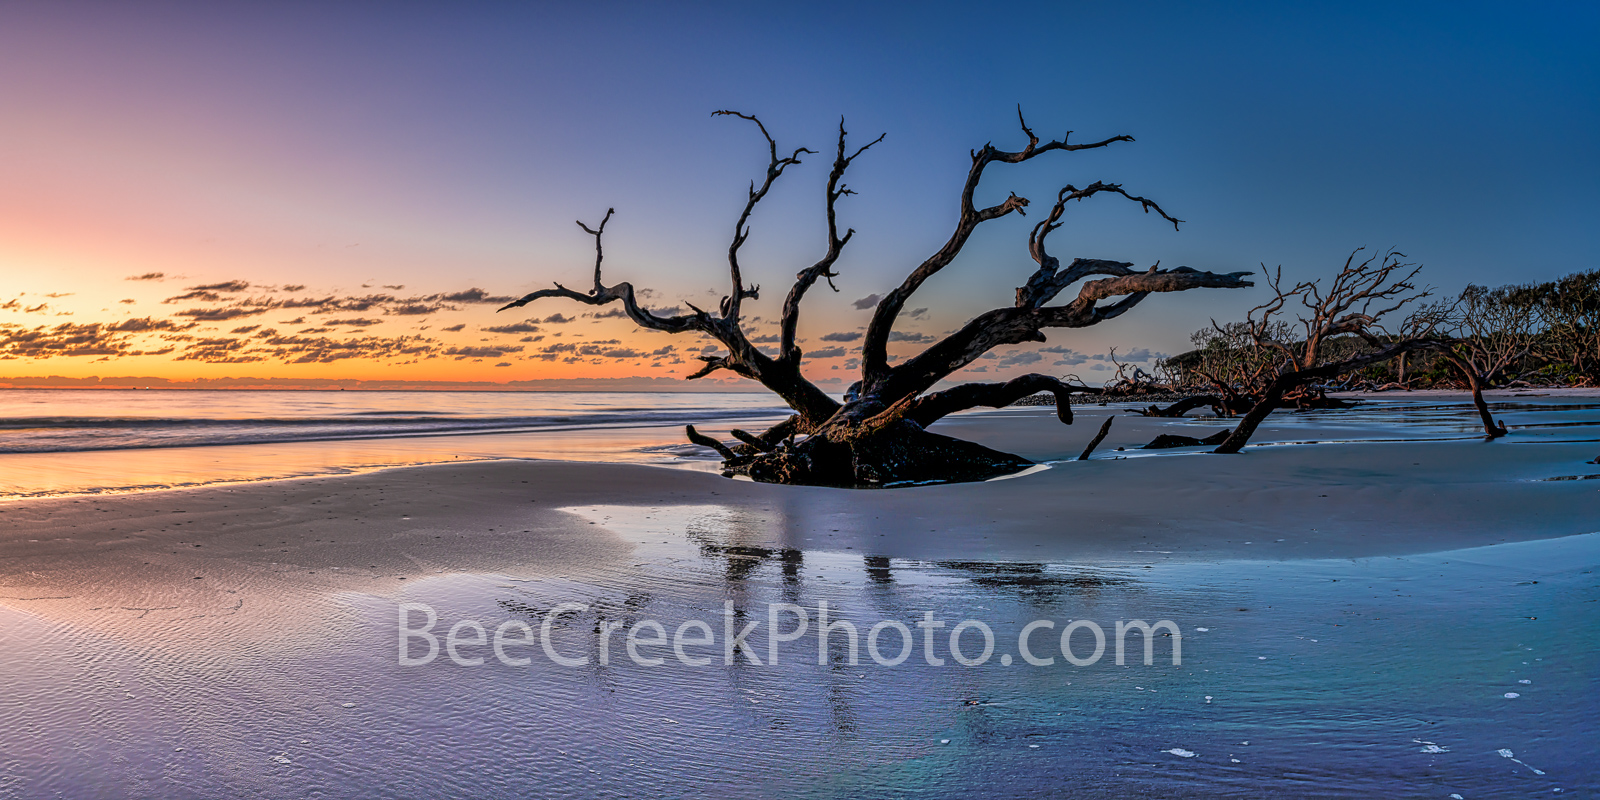 Sunrise at Driftwood Beach Pano 2 - Jekyll Island driftwood beach with trees in the sand at sunrise as a 2 to 1 panorama.  It...